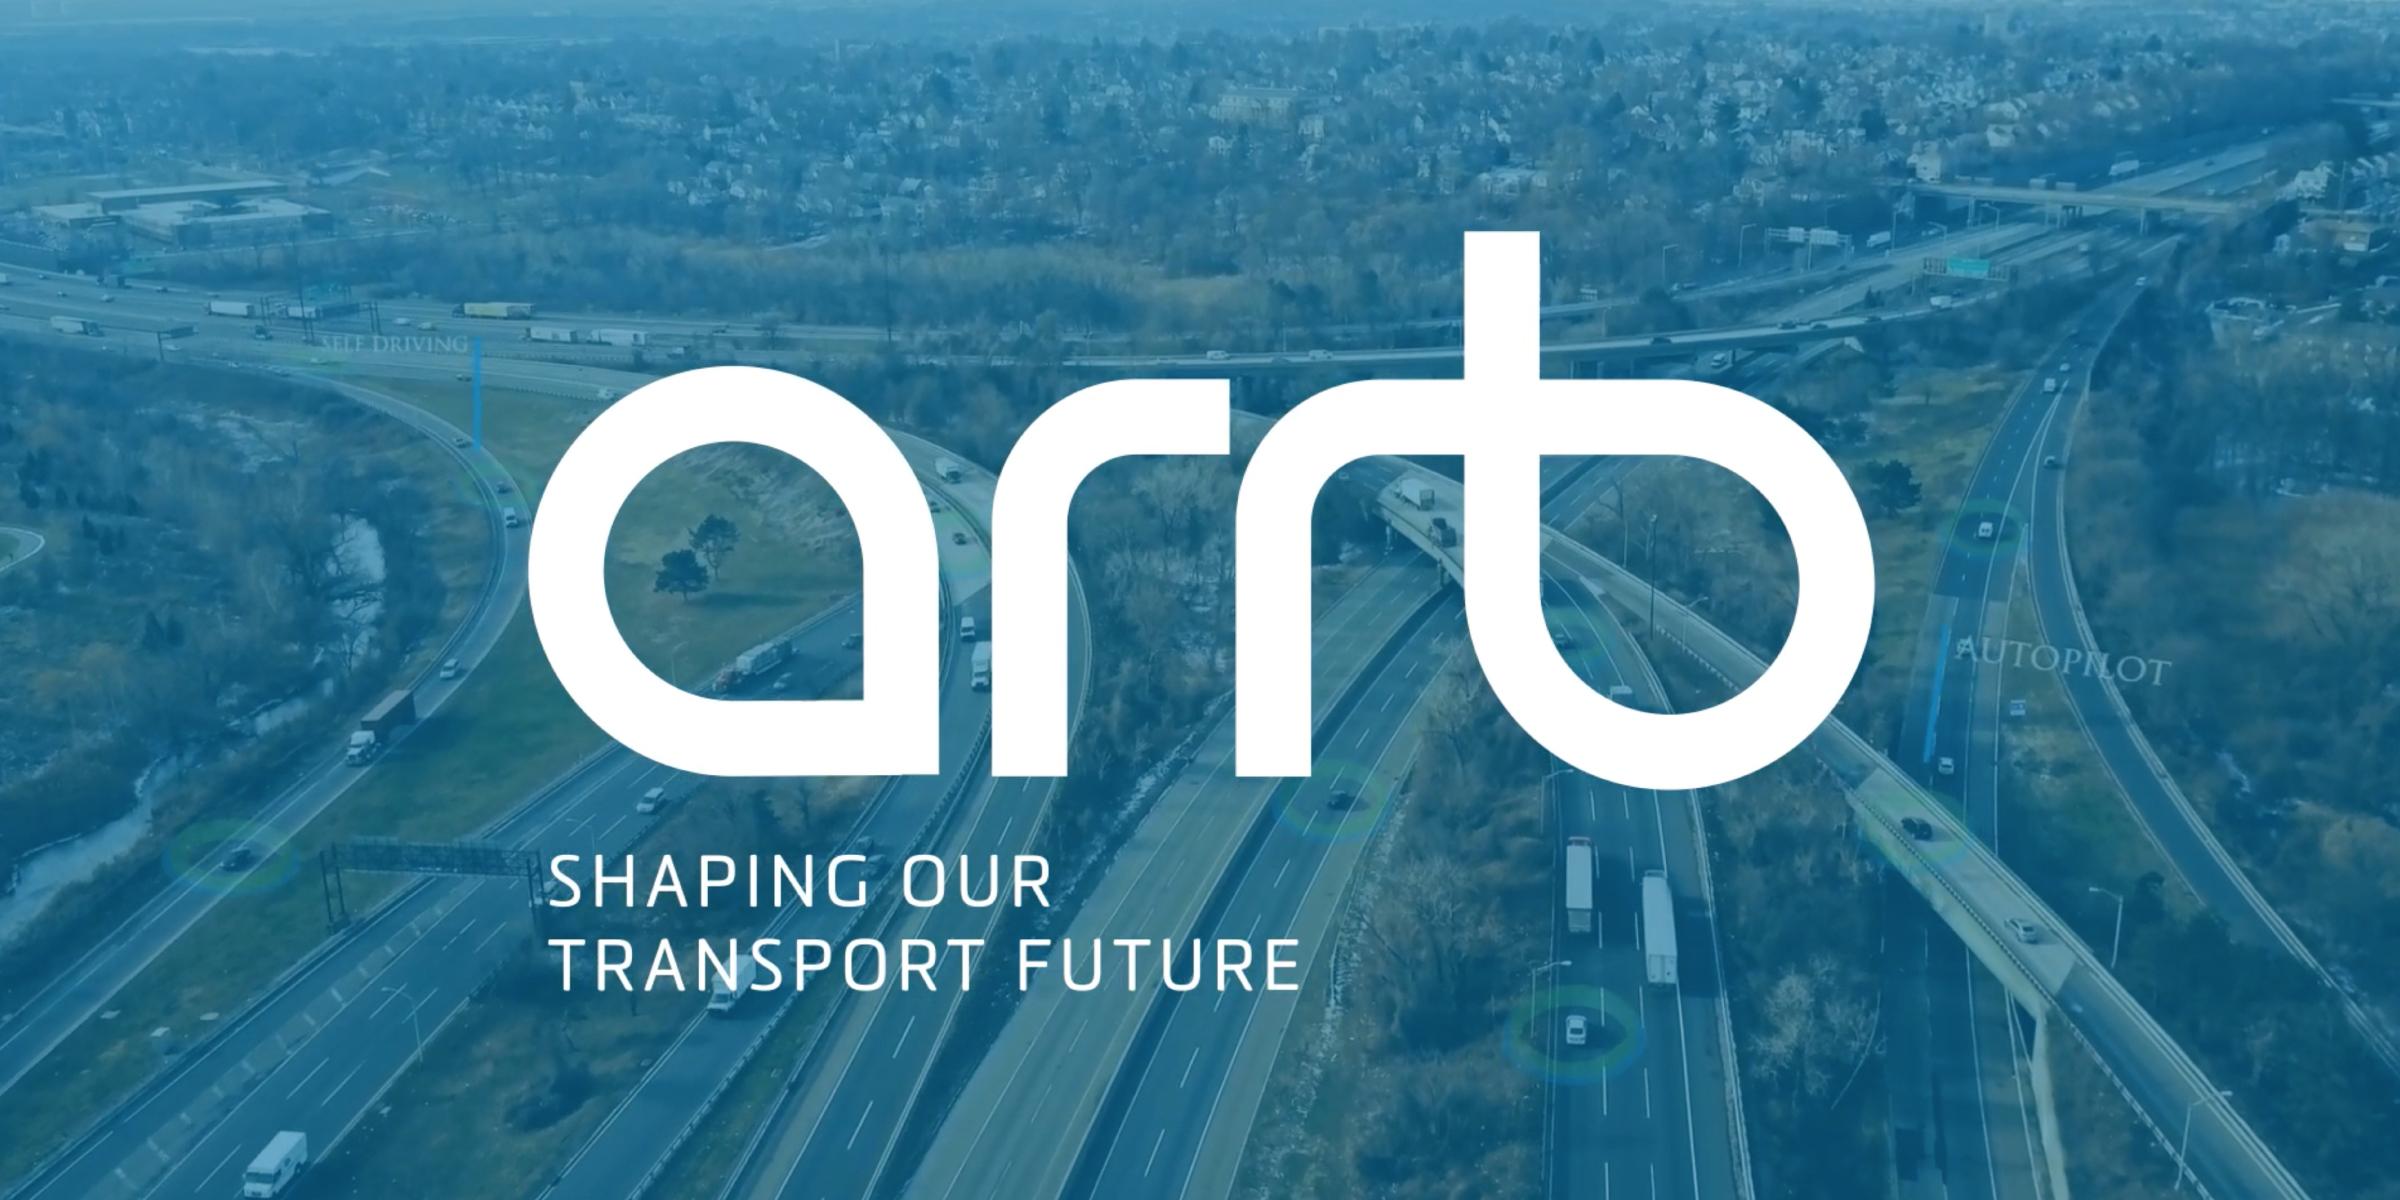 ARRB Brand Identity Video